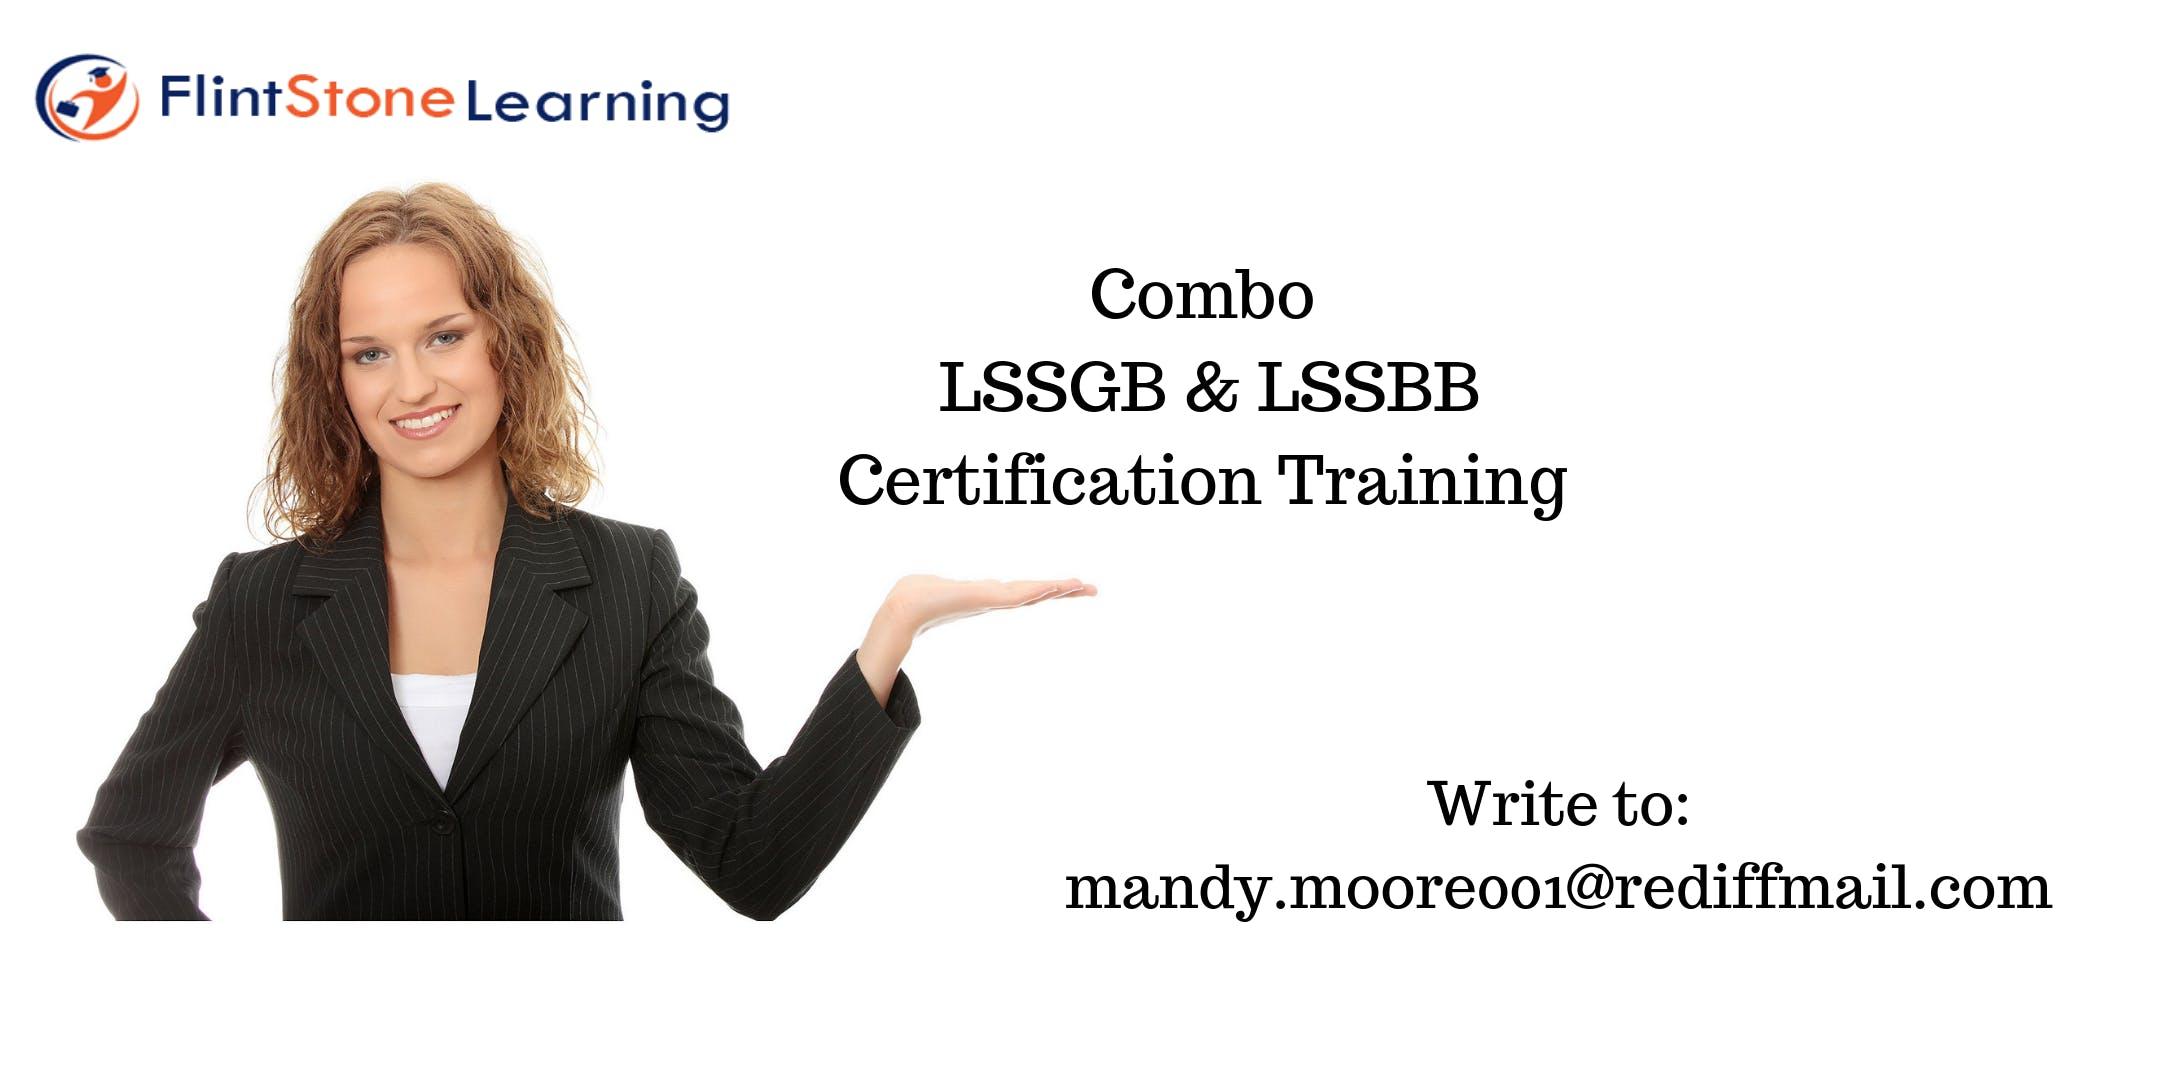 Combo LSSGB & LSSBB Bootcamp Training in Eureka, CA